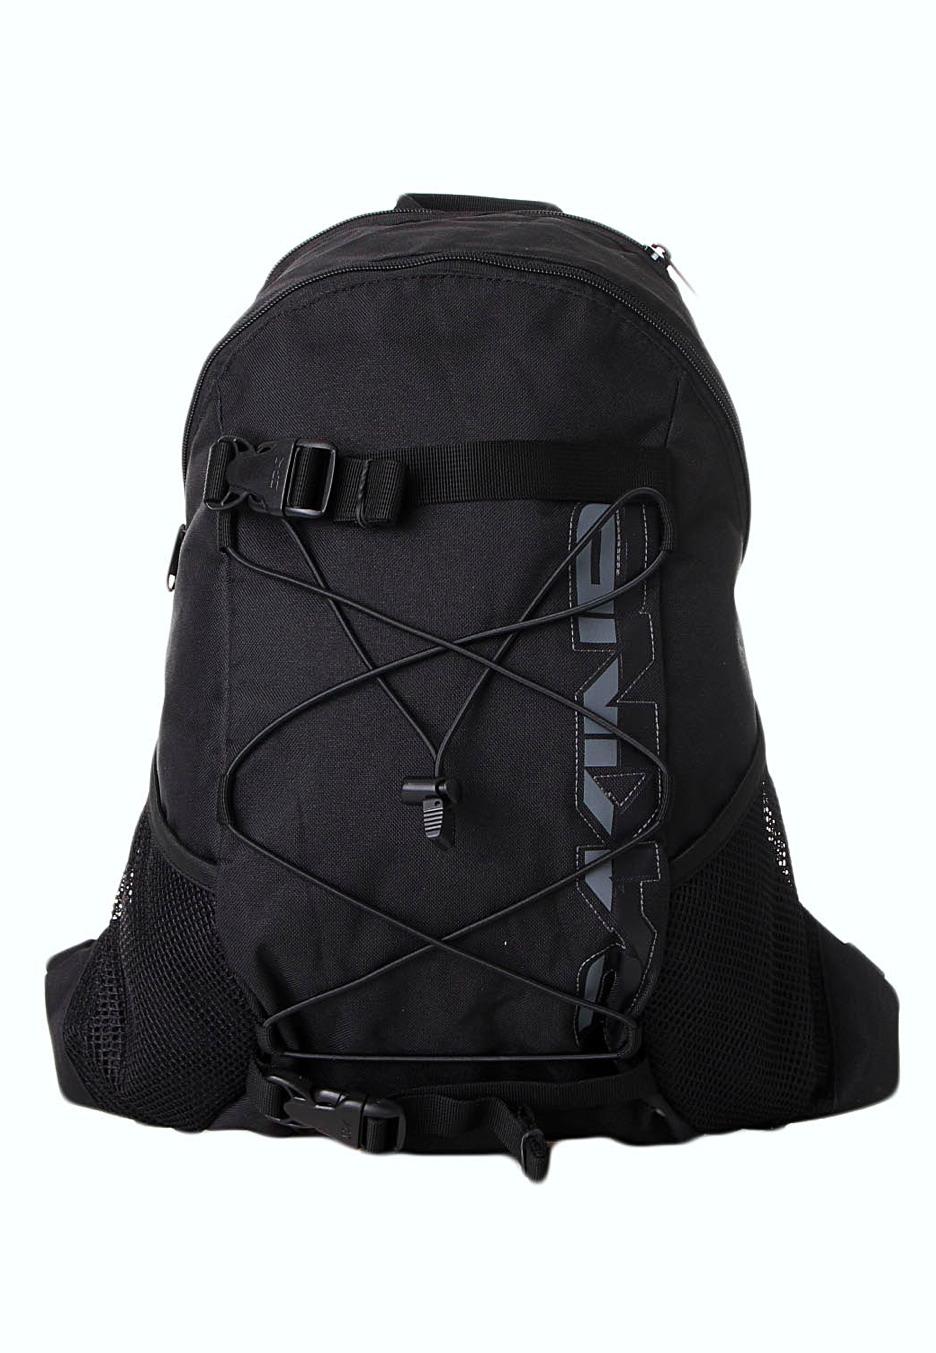 Dakine - Wonder - Backpack - Impericon.com Worldwide